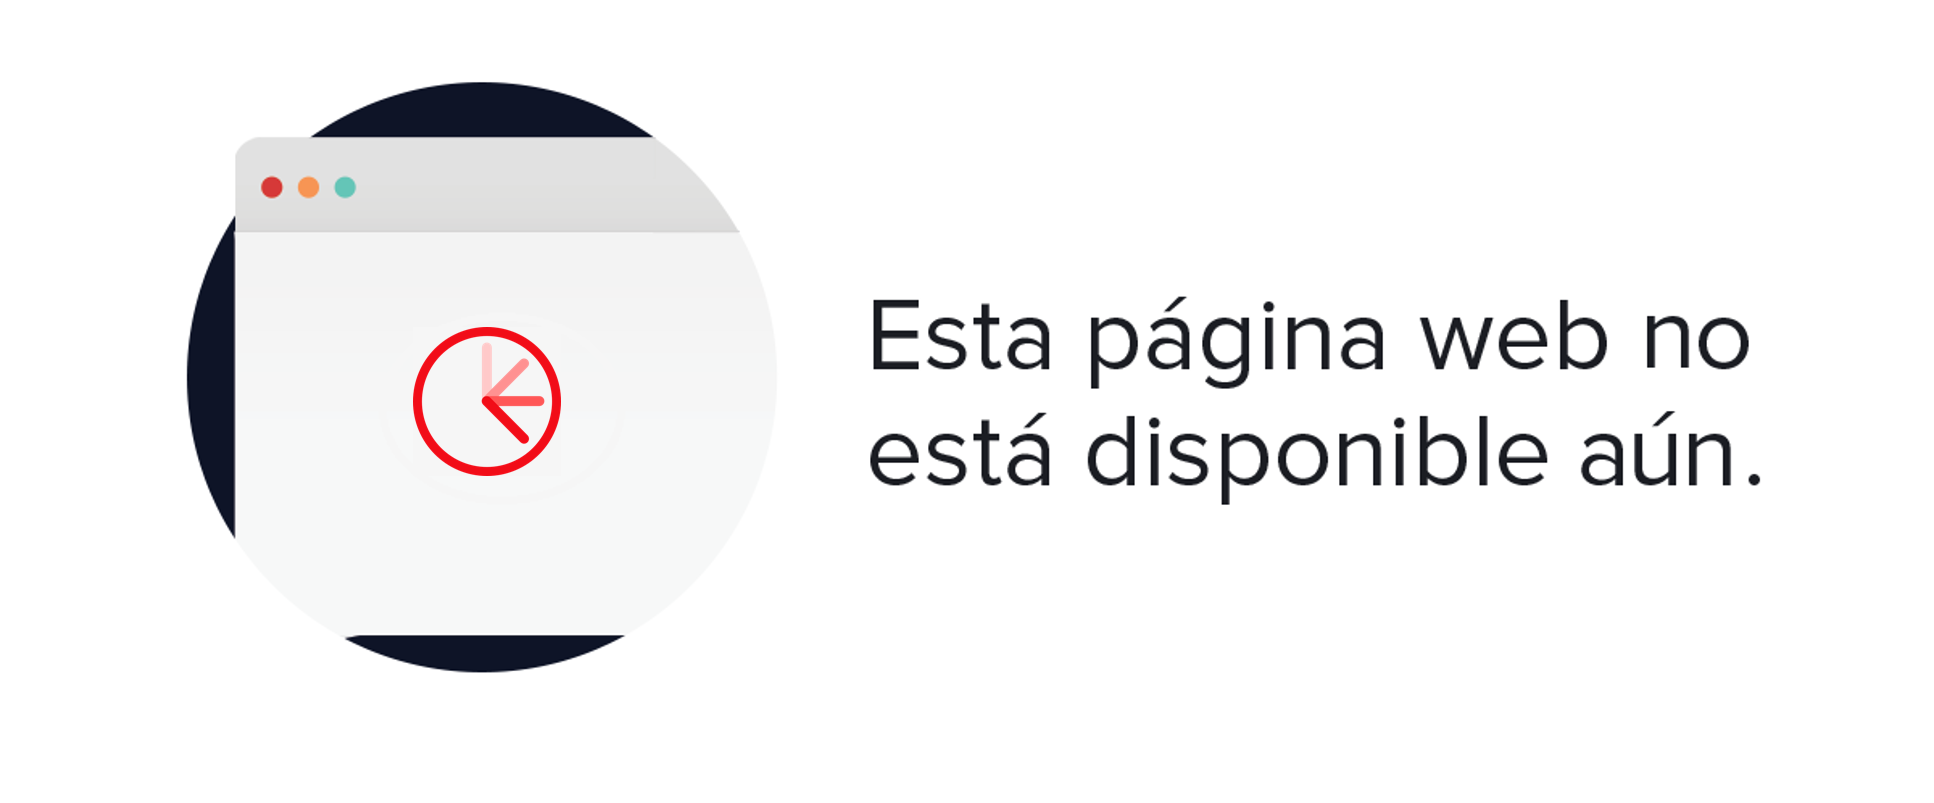 Esprit - Blazer de mujer Esprit con raya diplomática y doble botón Azul marino 001046347100185036 - FCEWHGQ